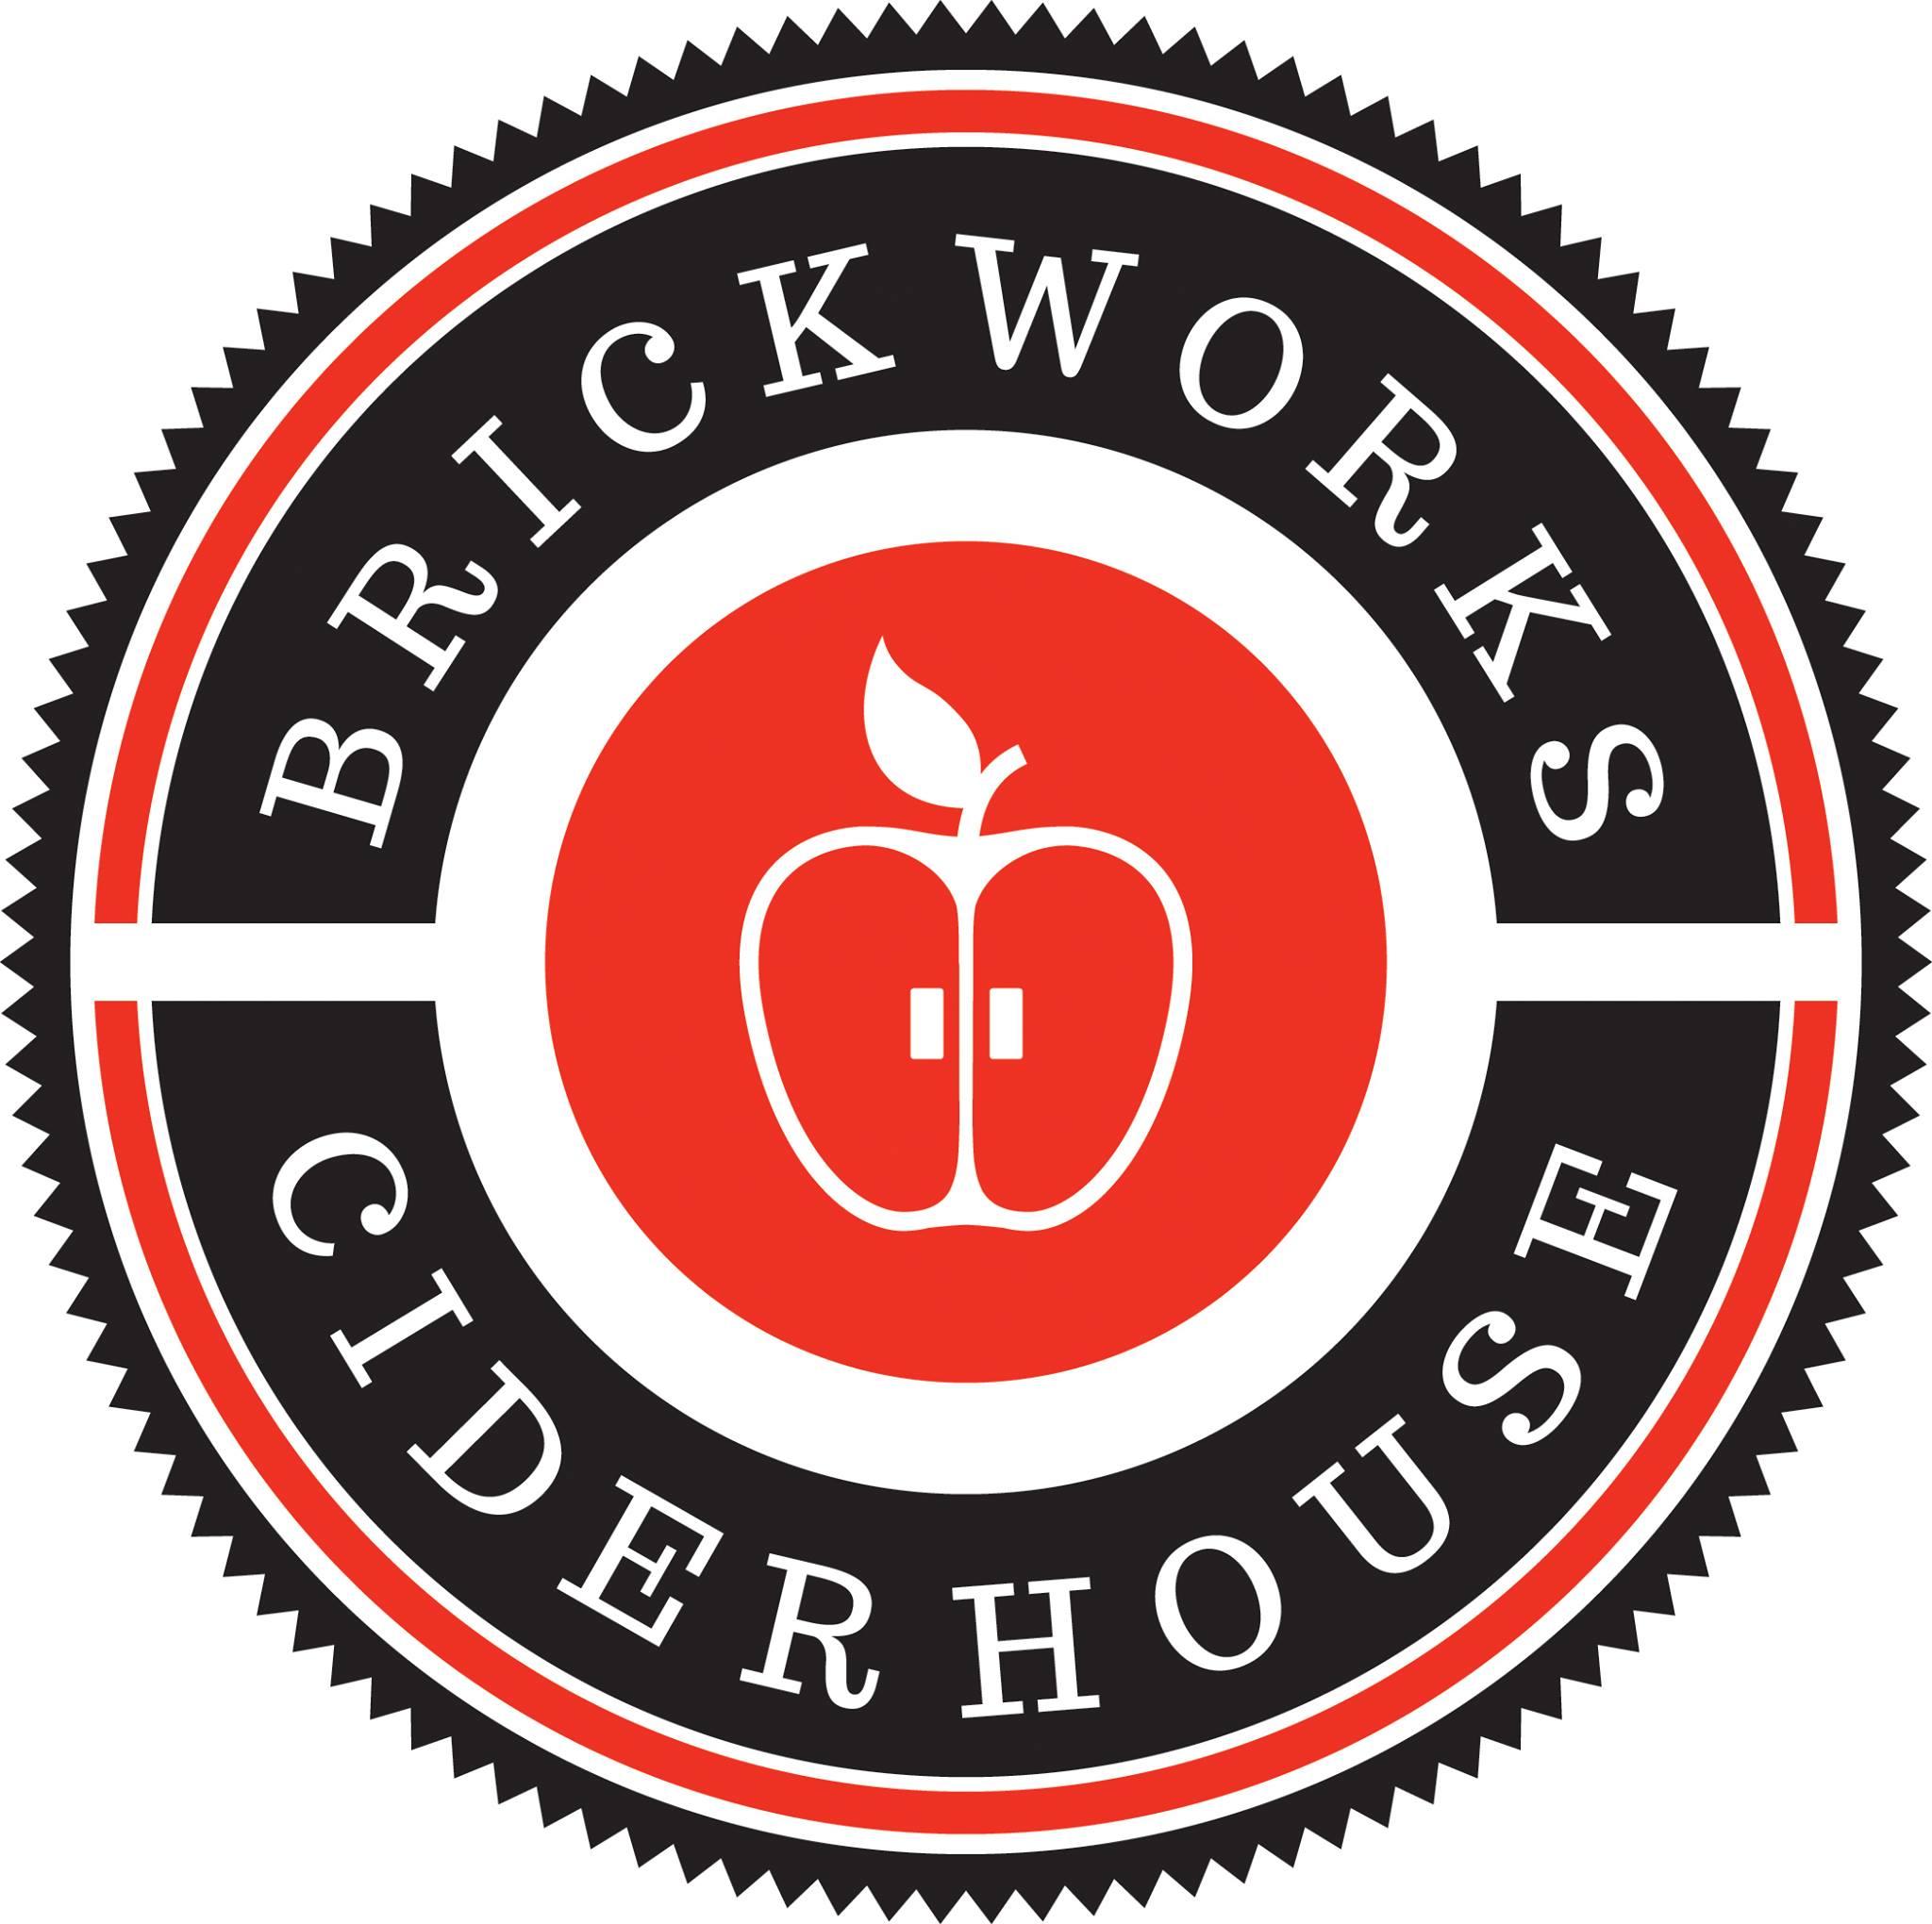 Brickworks Ciderhouse